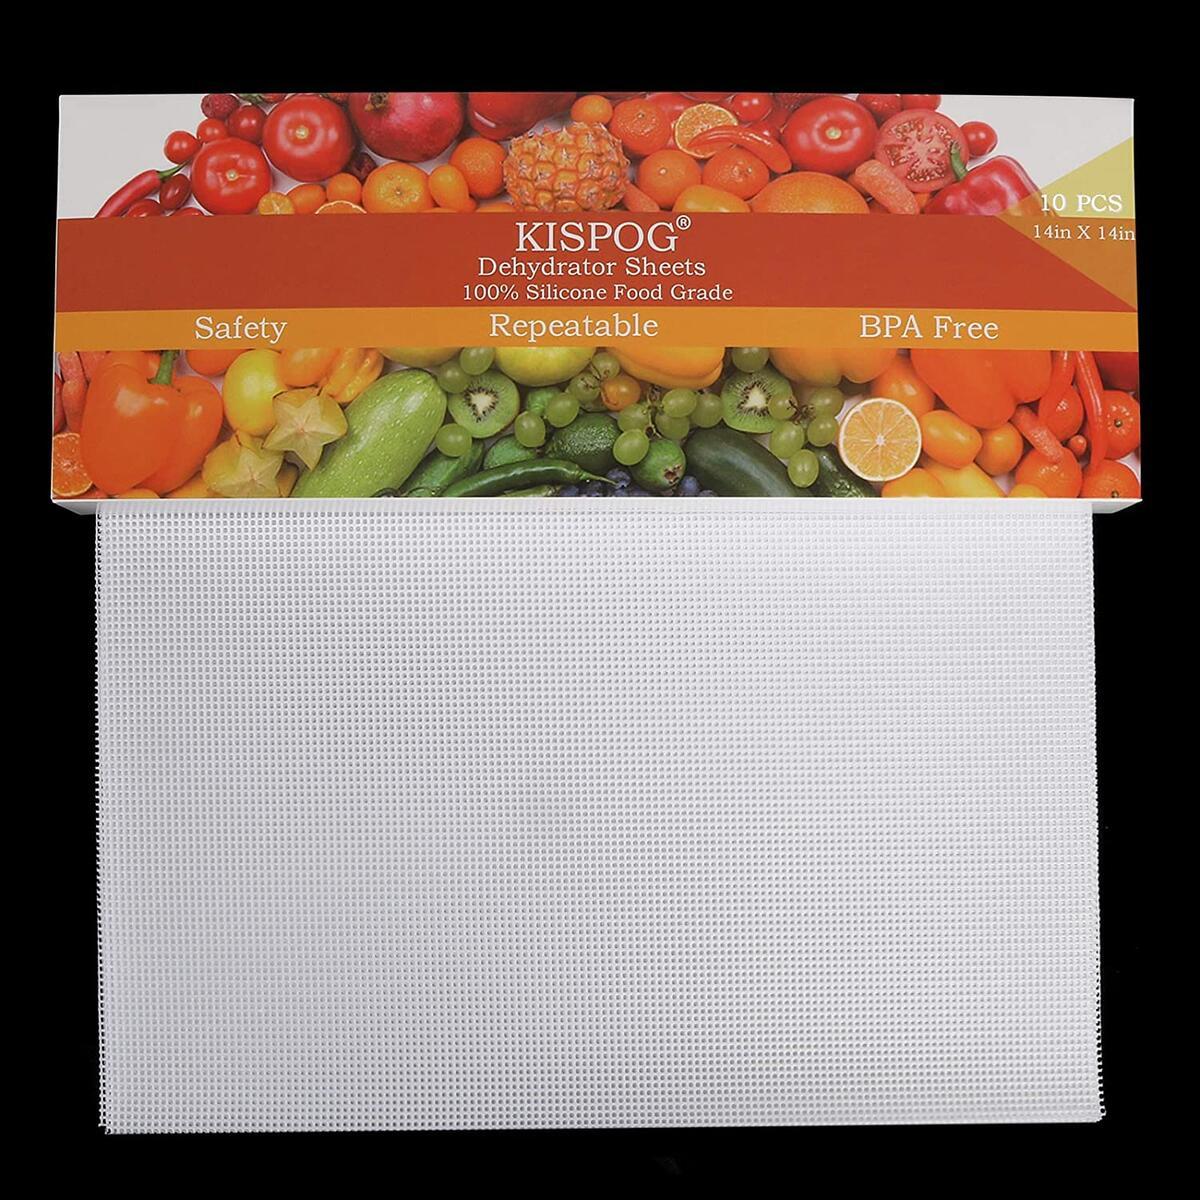 Kispog 10Pcs/Set Premium Non-Stick Silicone Dehydrator Sheets for Food Dehydrator Machine, 14x14 in